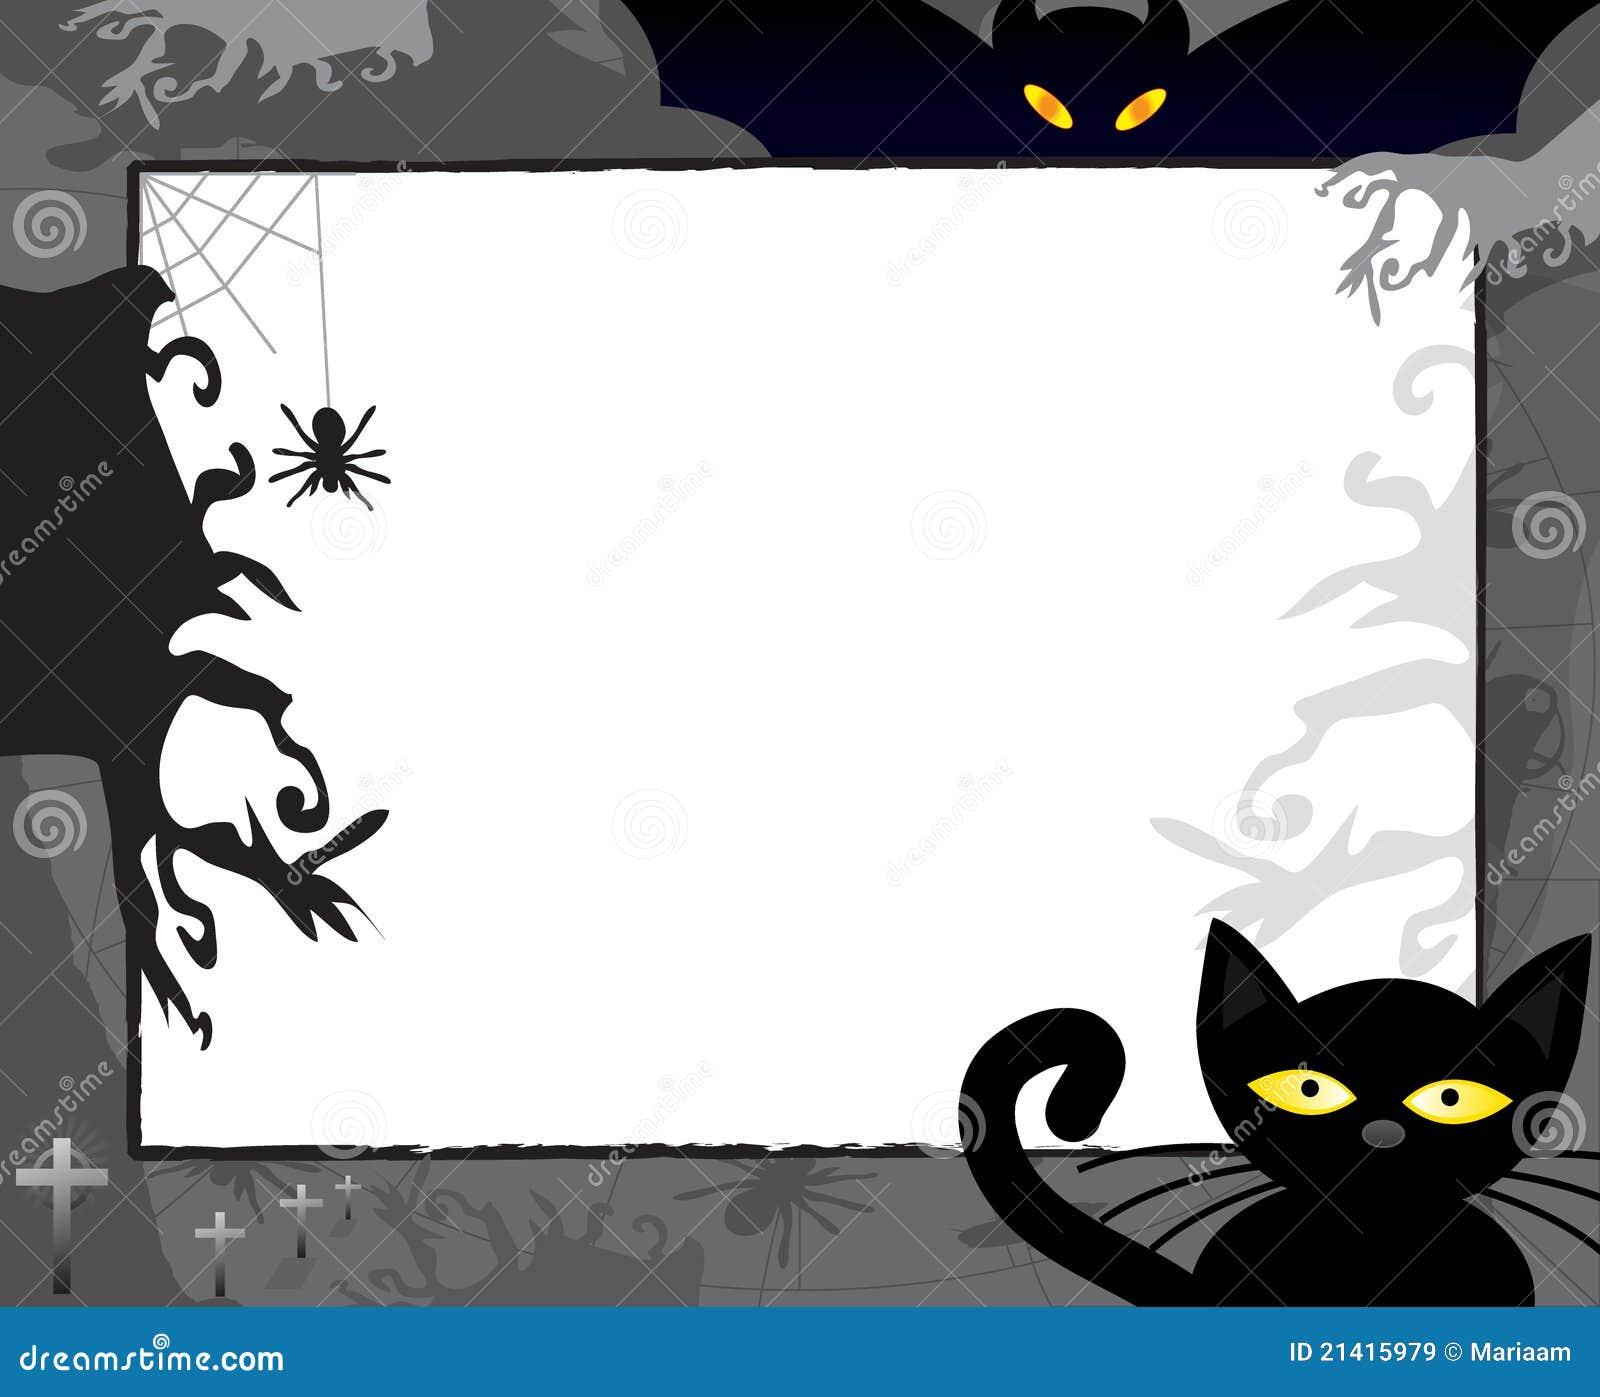 Scary Halloween Decor